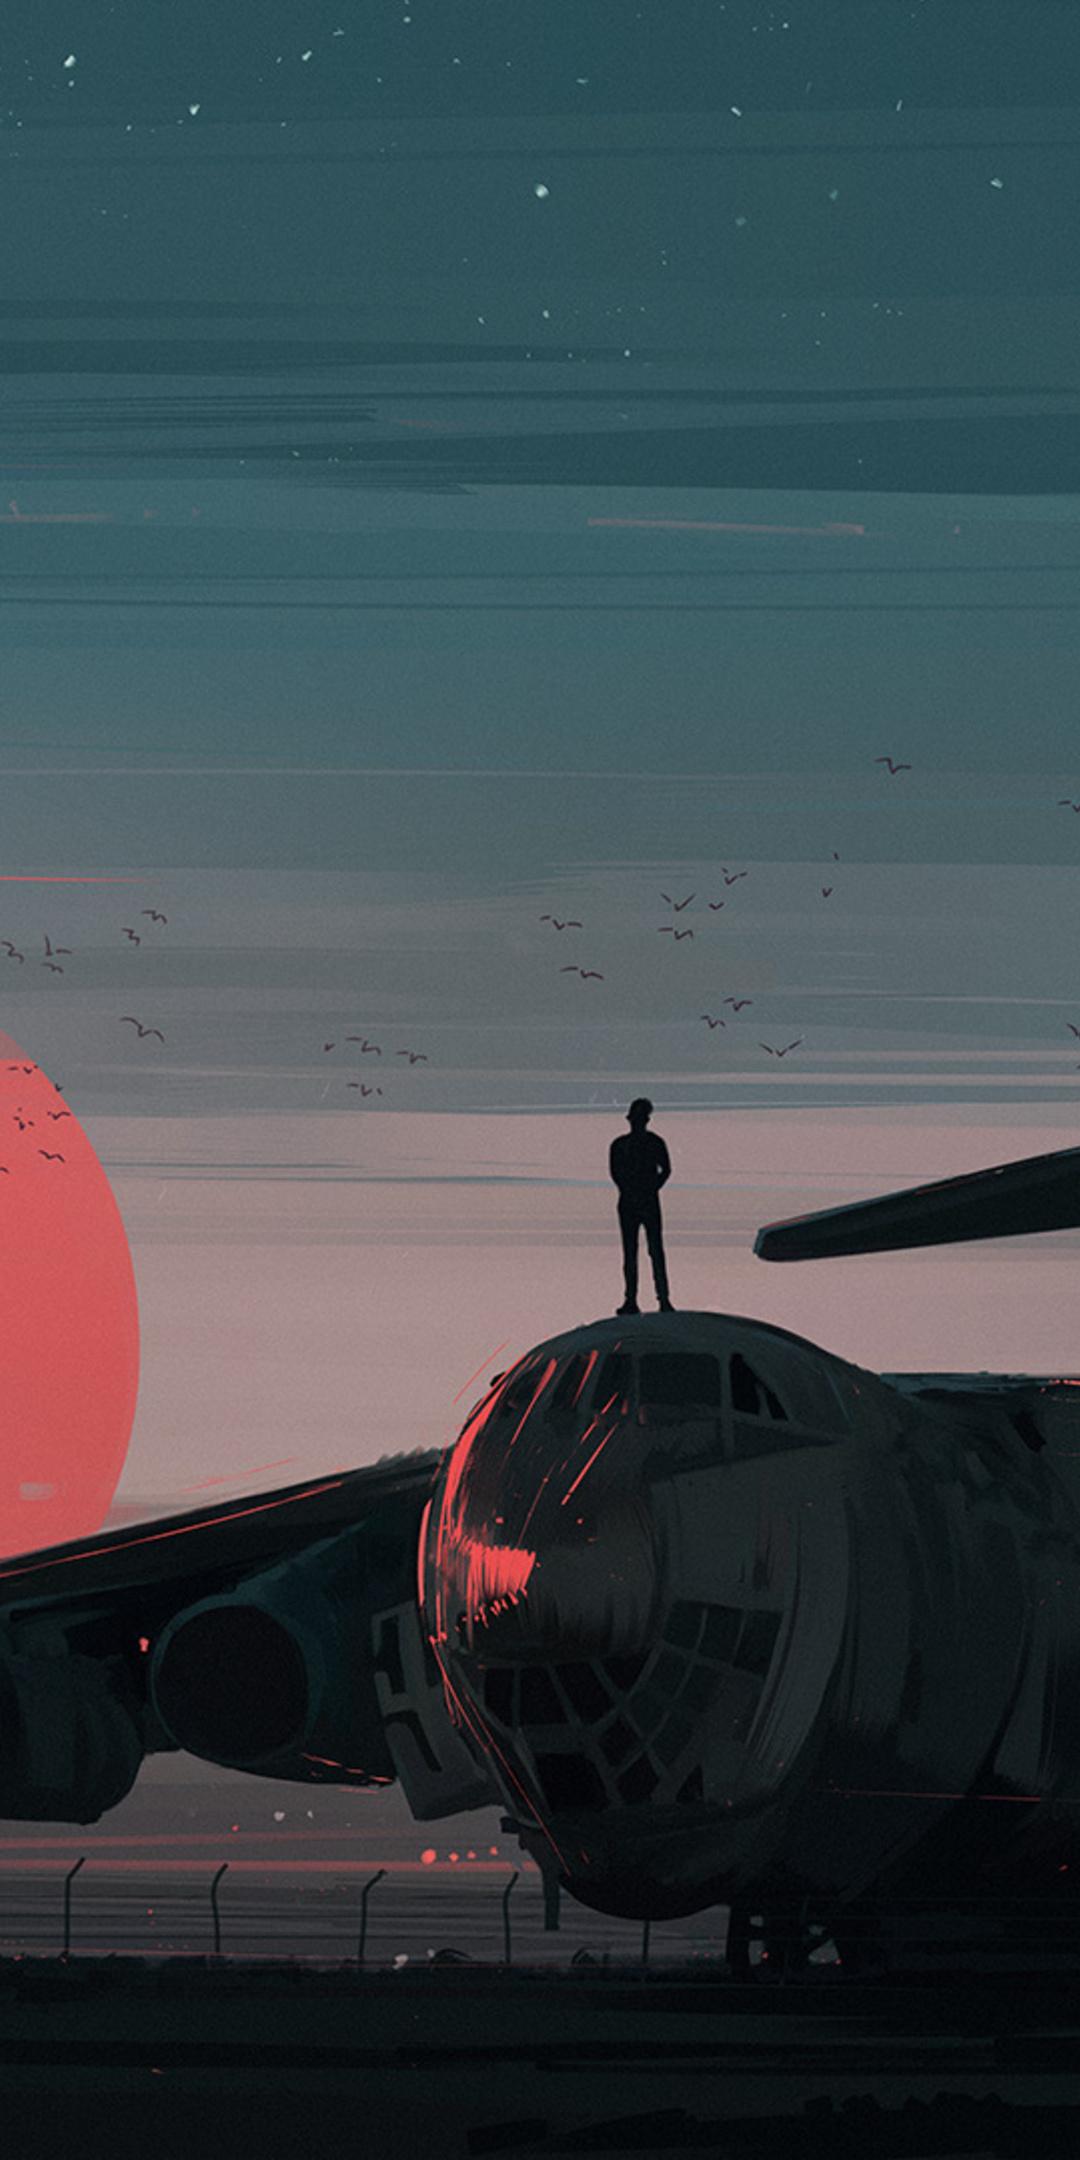 man-standing-on-plane-aero-cityscape-digital-art-s1.jpg